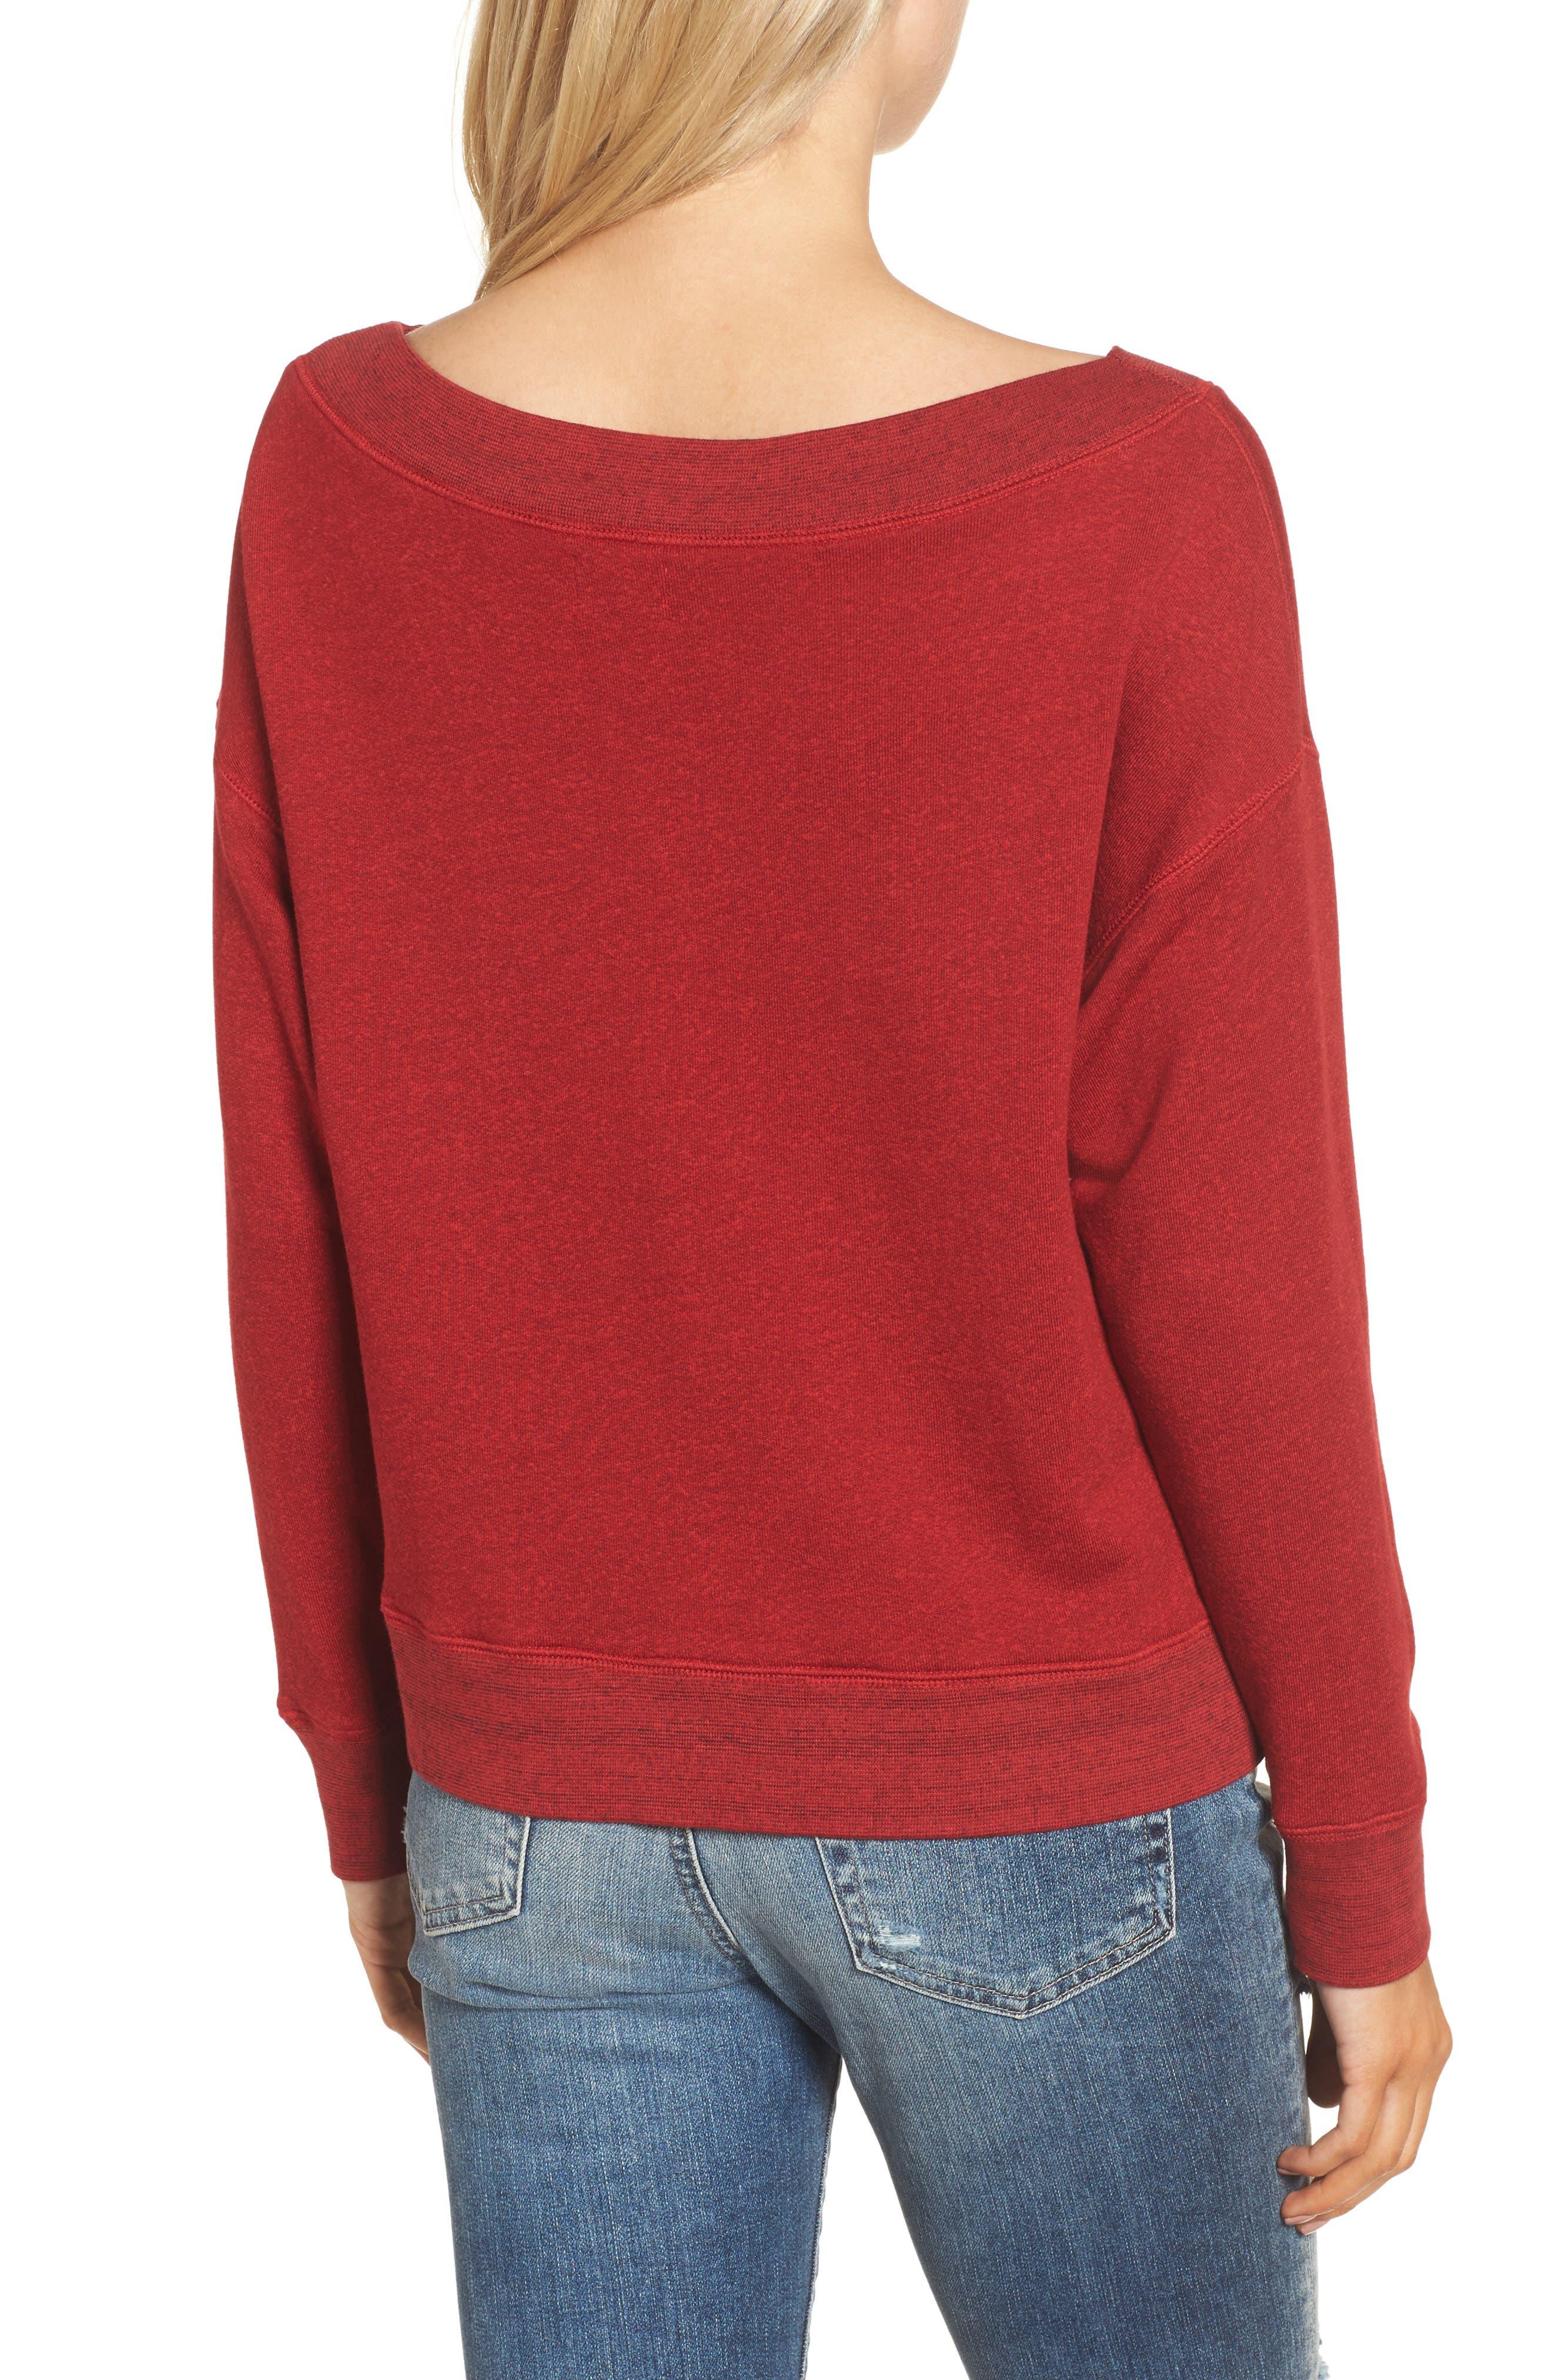 Alternate Image 2  - Sundry Sleigh All Day Sweatshirt (Nordstrom Exclusive)